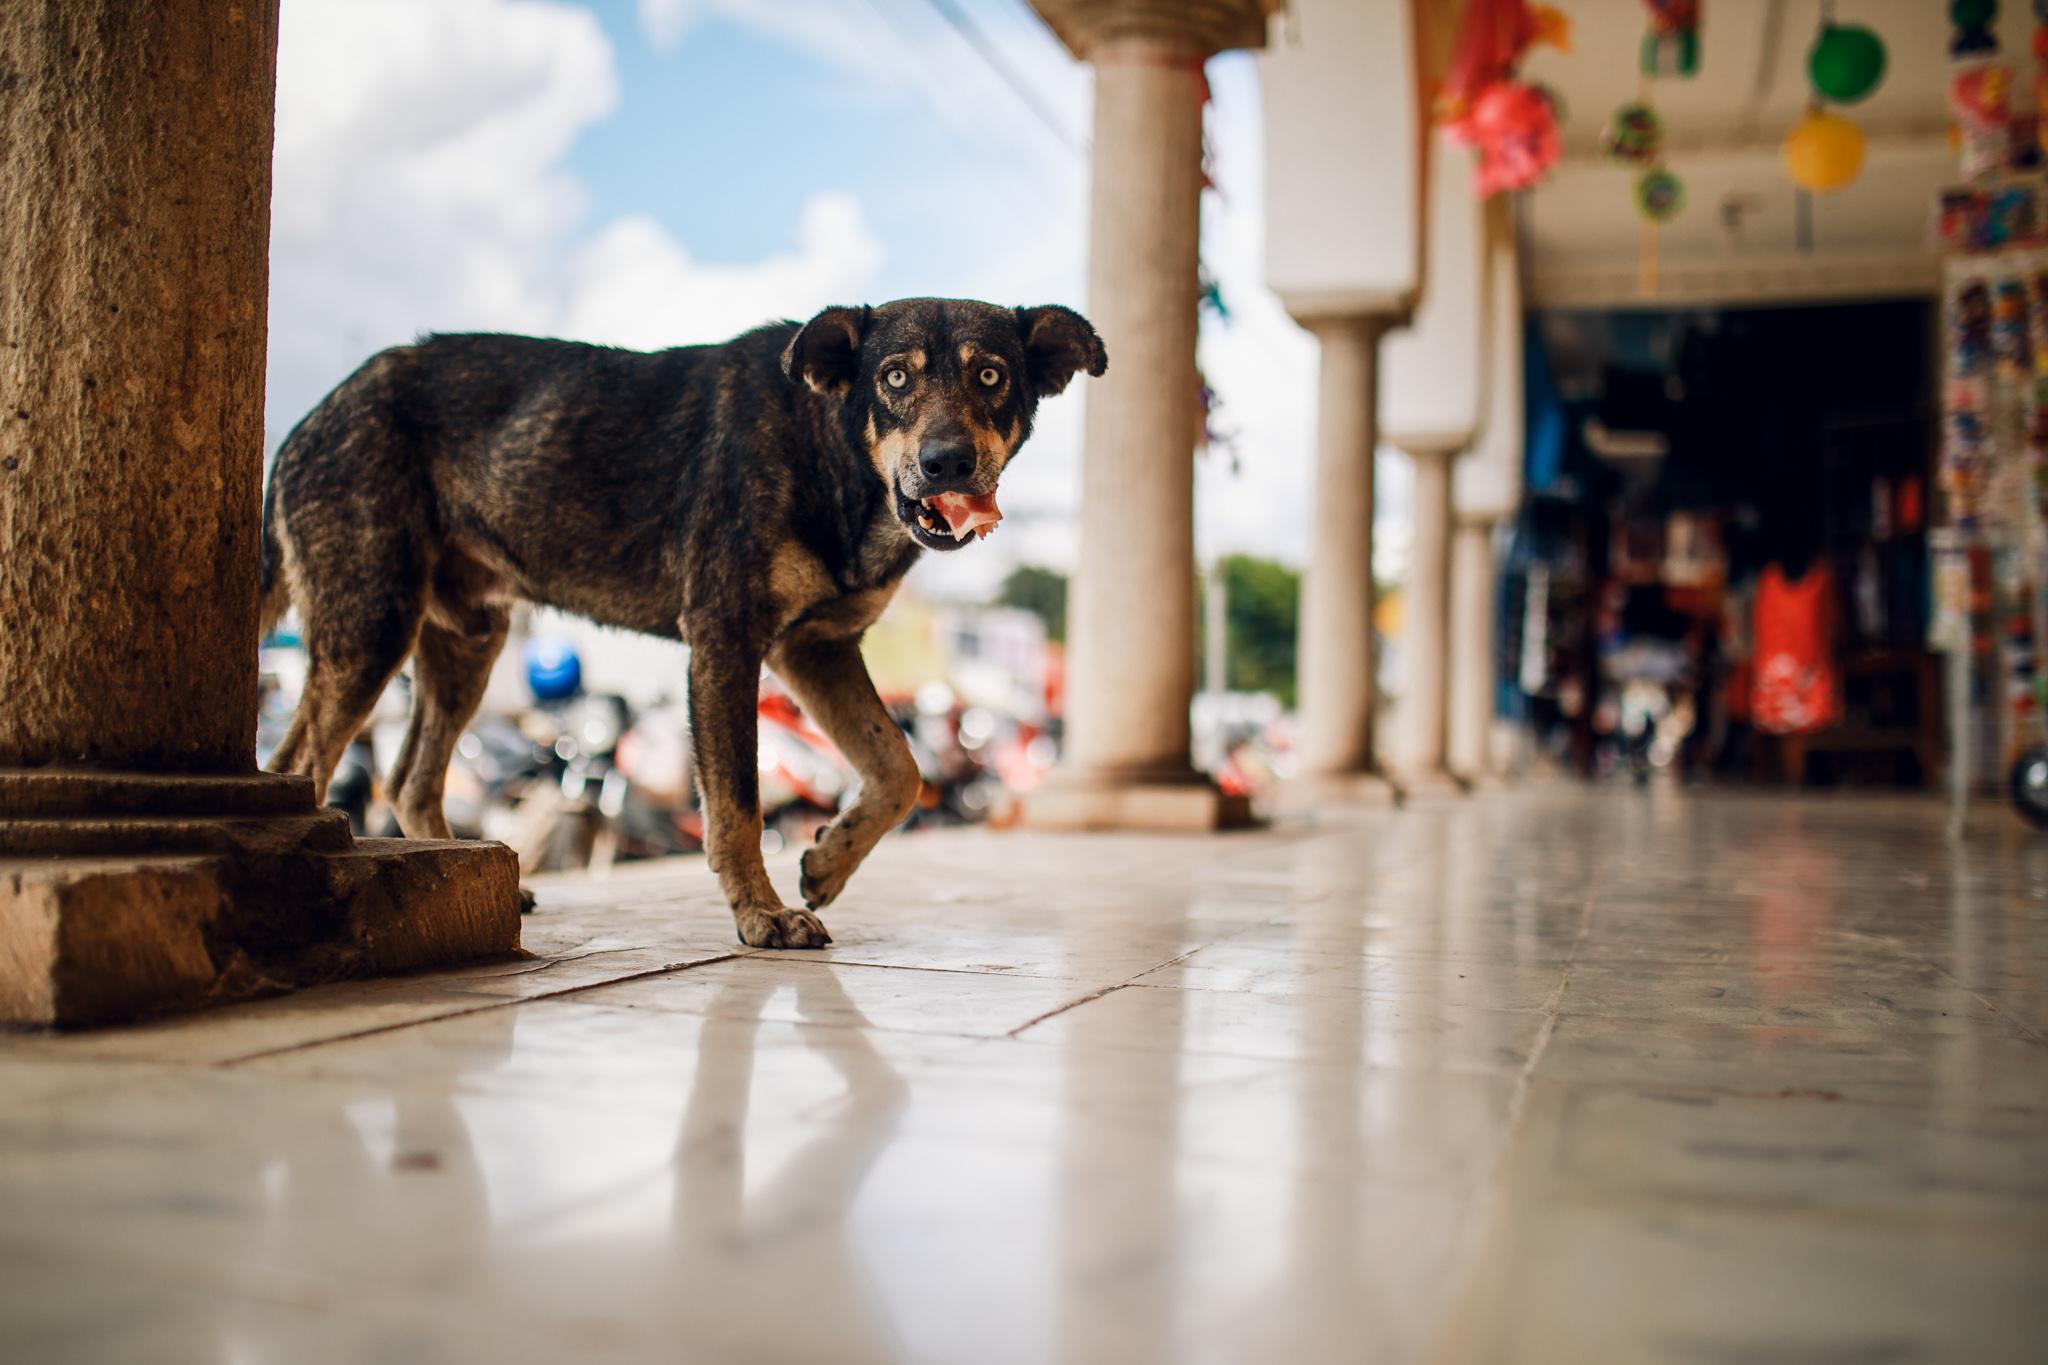 Street Animals